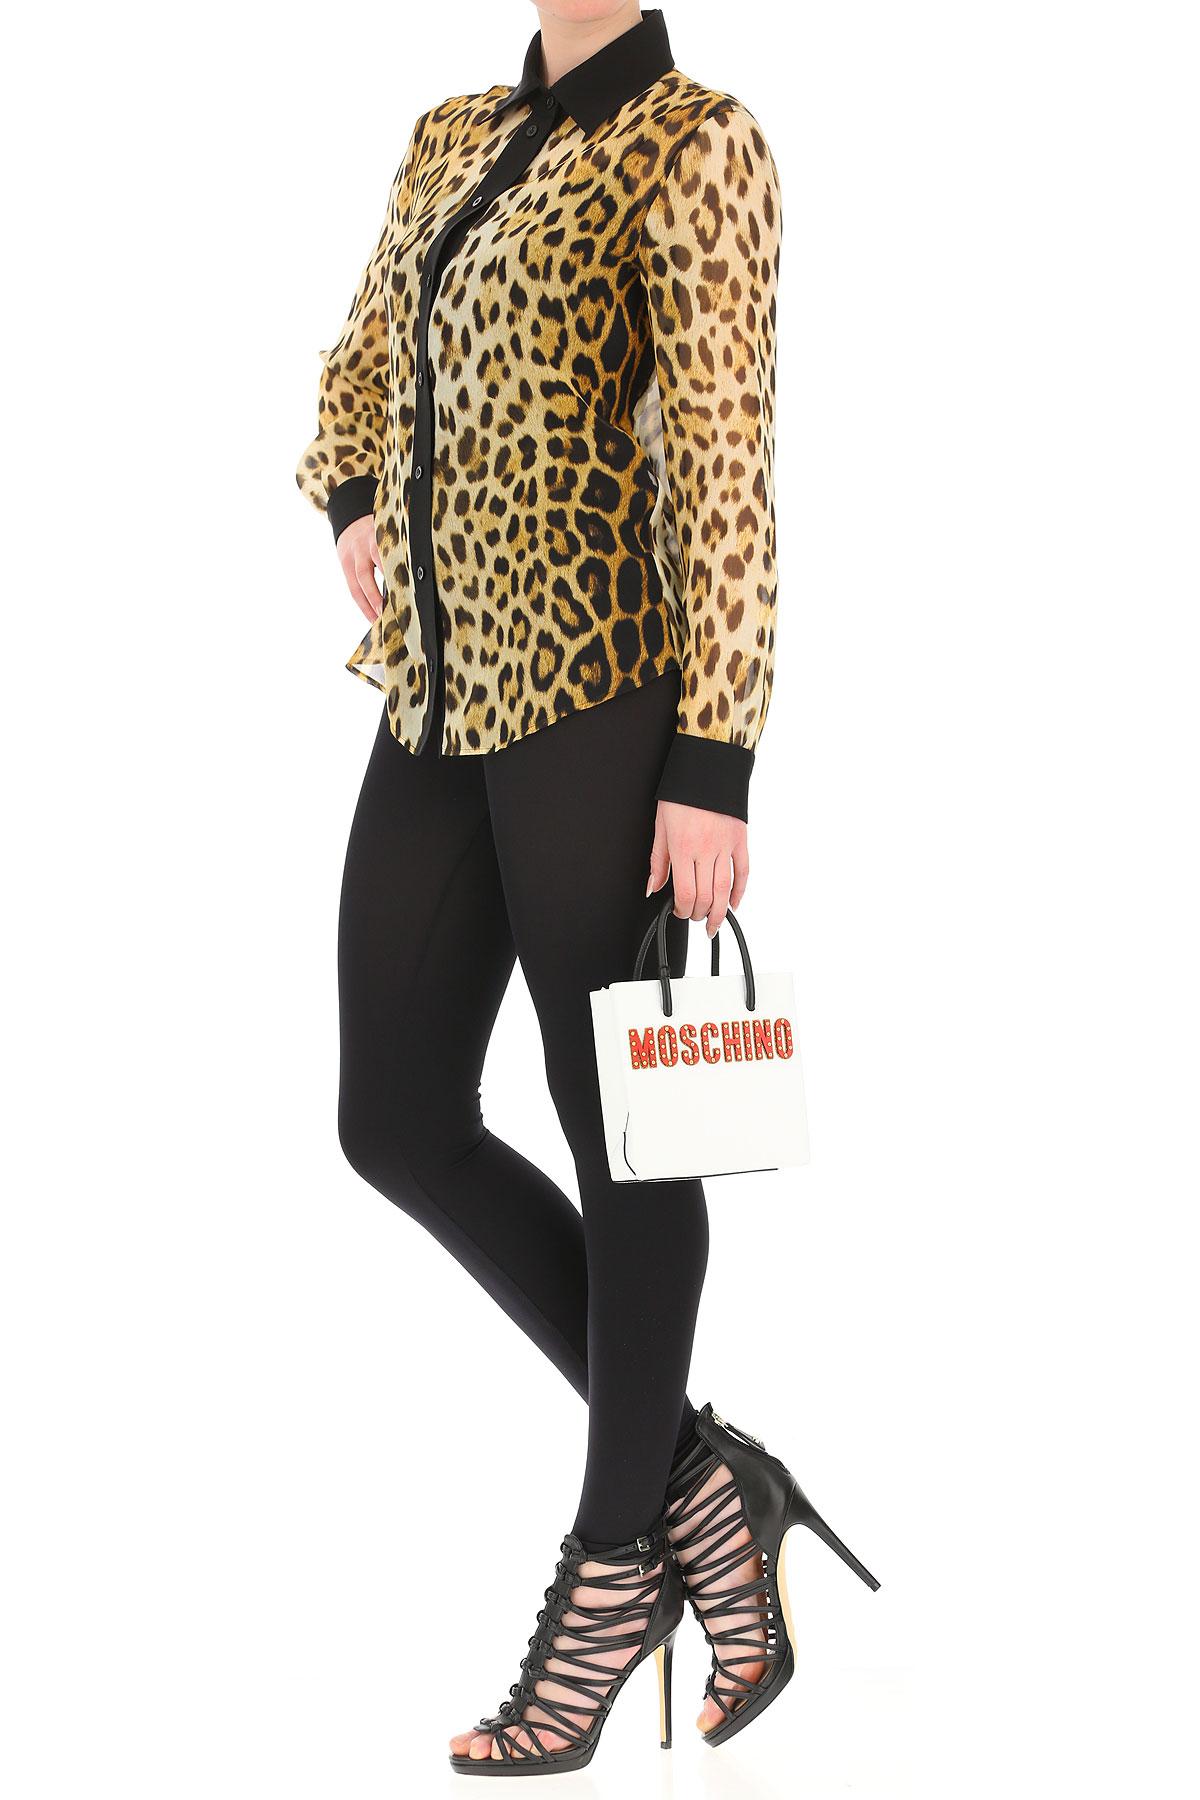 Mujer verano Primavera Leopardo Ropa 2019 Moschino nbsp; Para O8nEq1